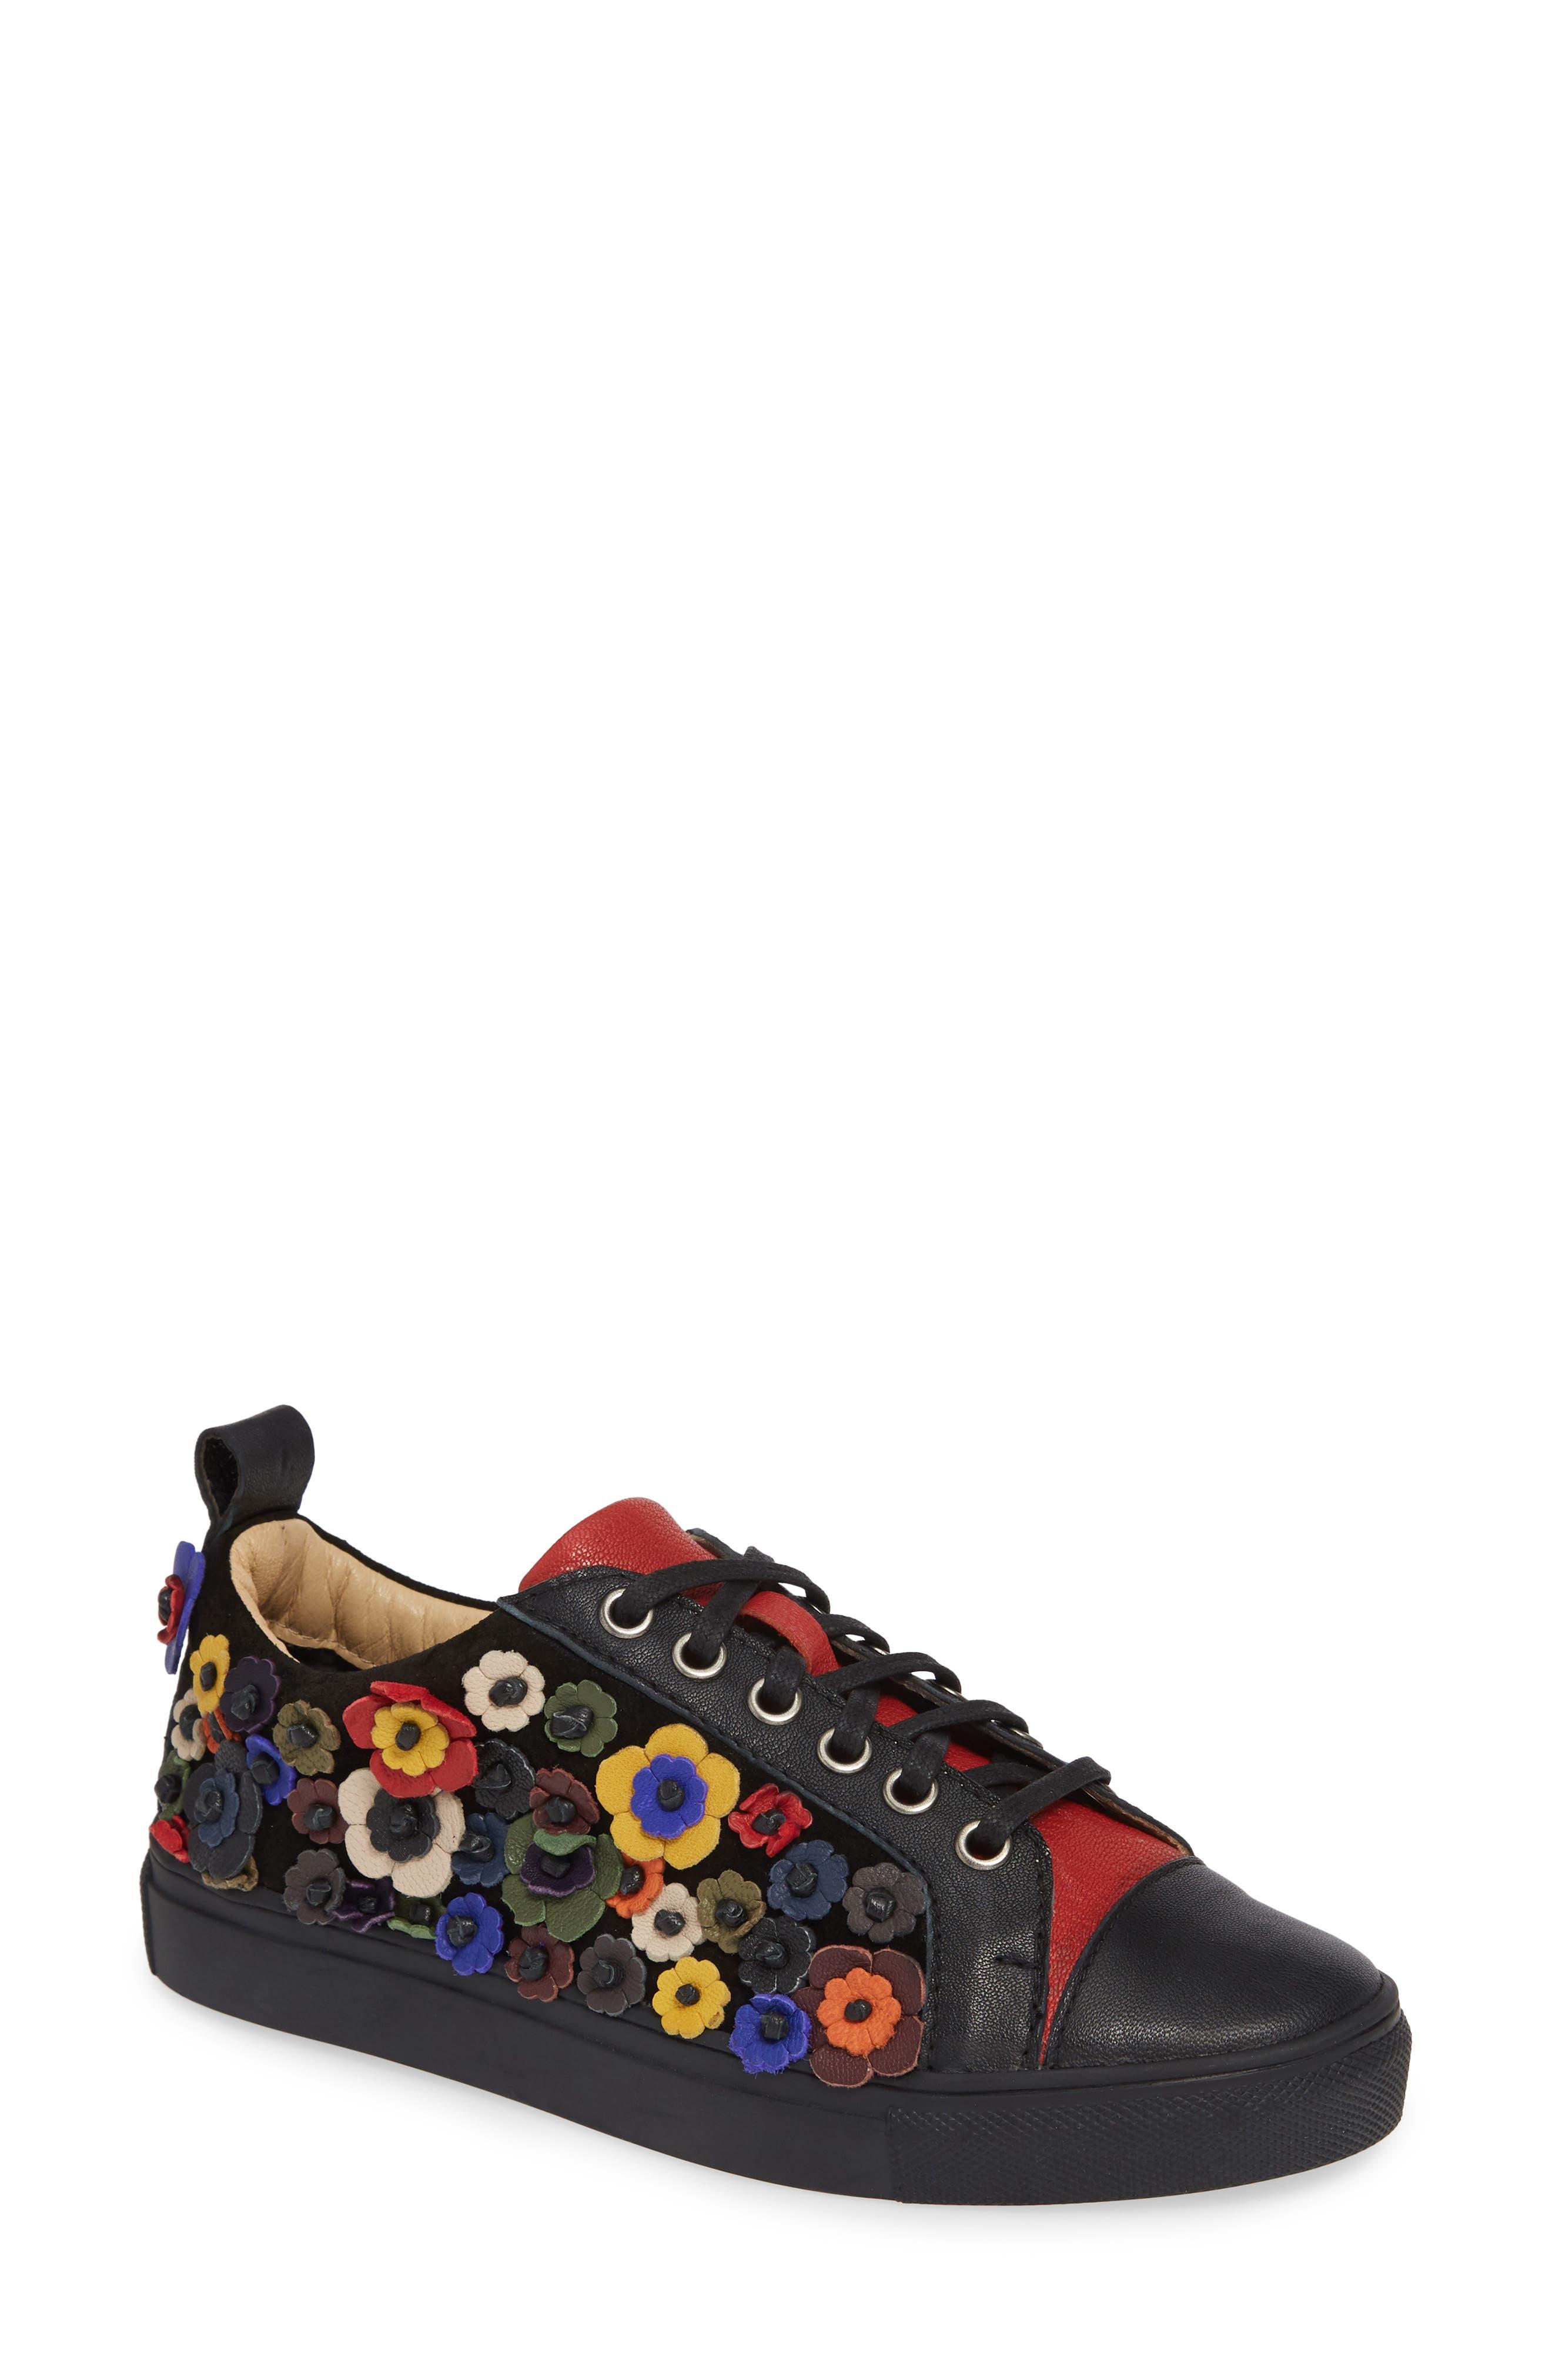 Sheridan Mia Satyr Sneaker Black